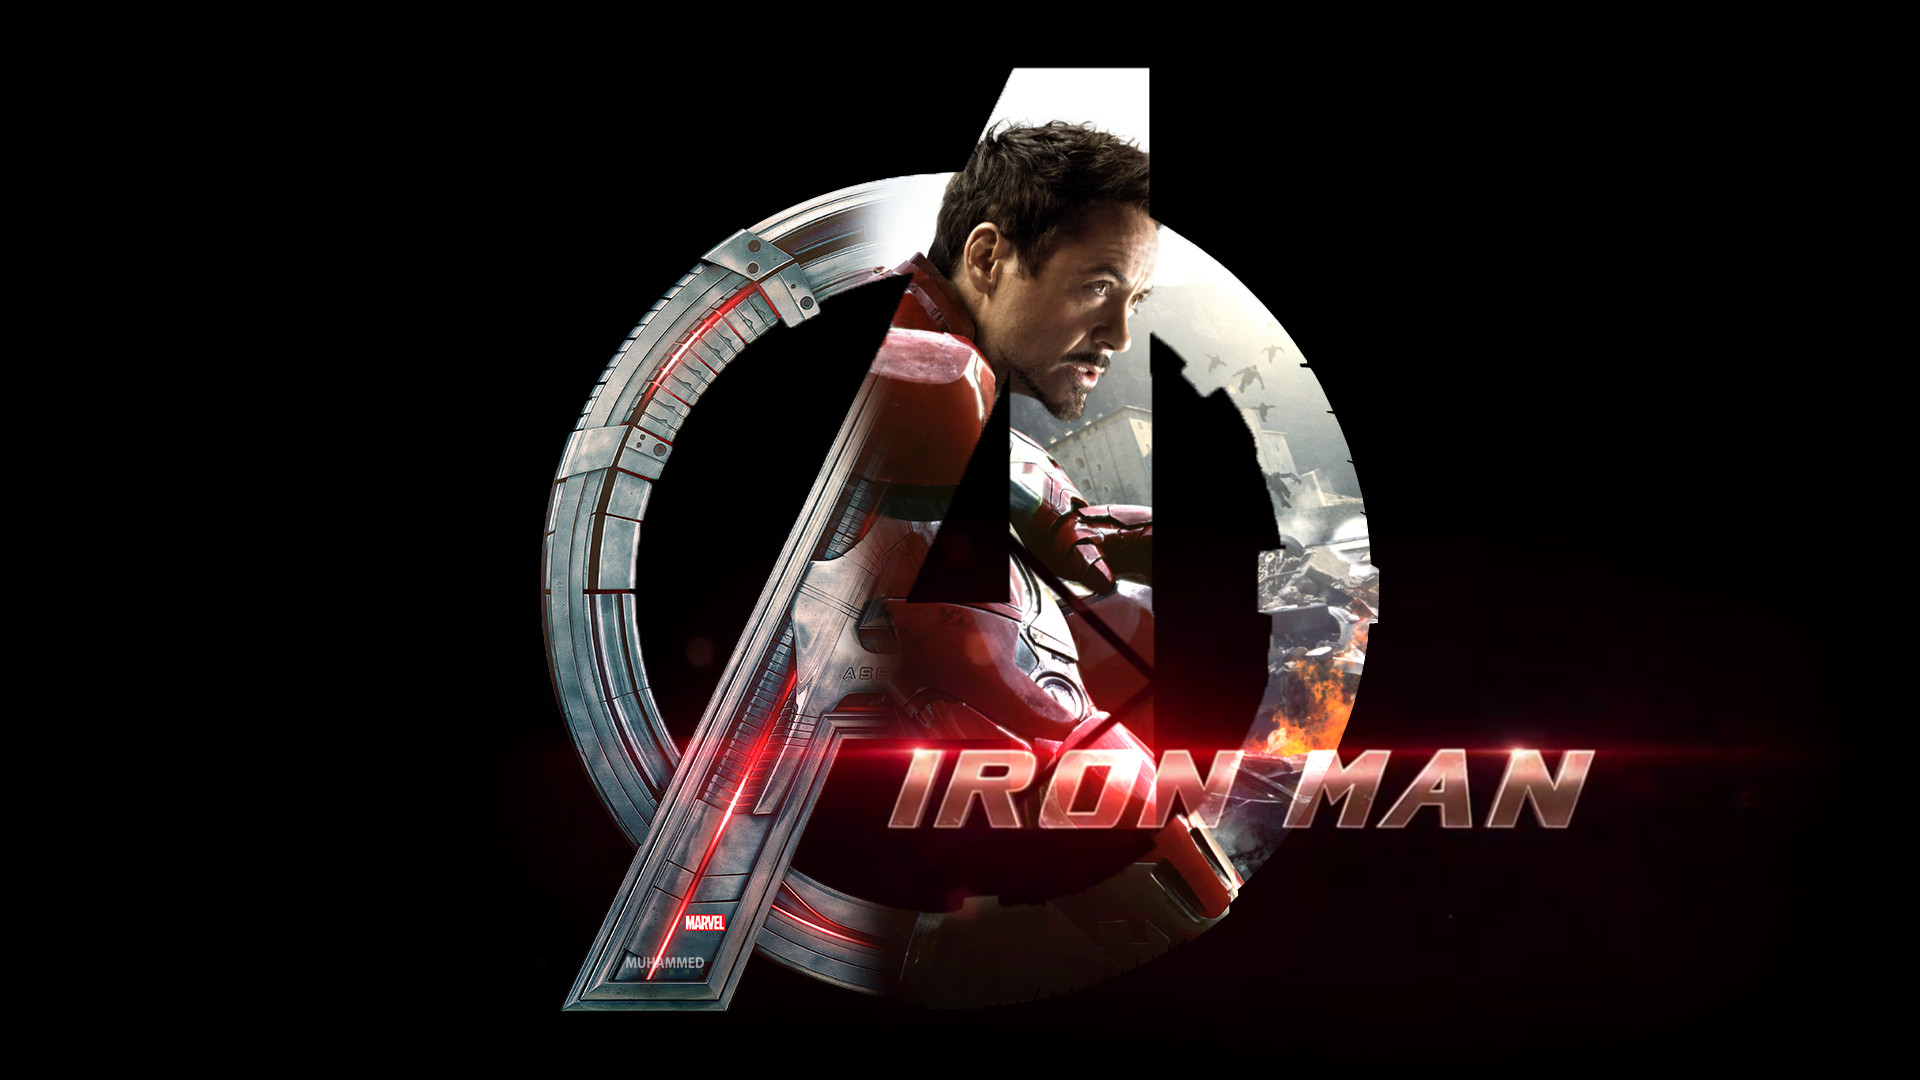 Iron Man Avengers Wallpaper 1080p Jarvis Comic Iphone .